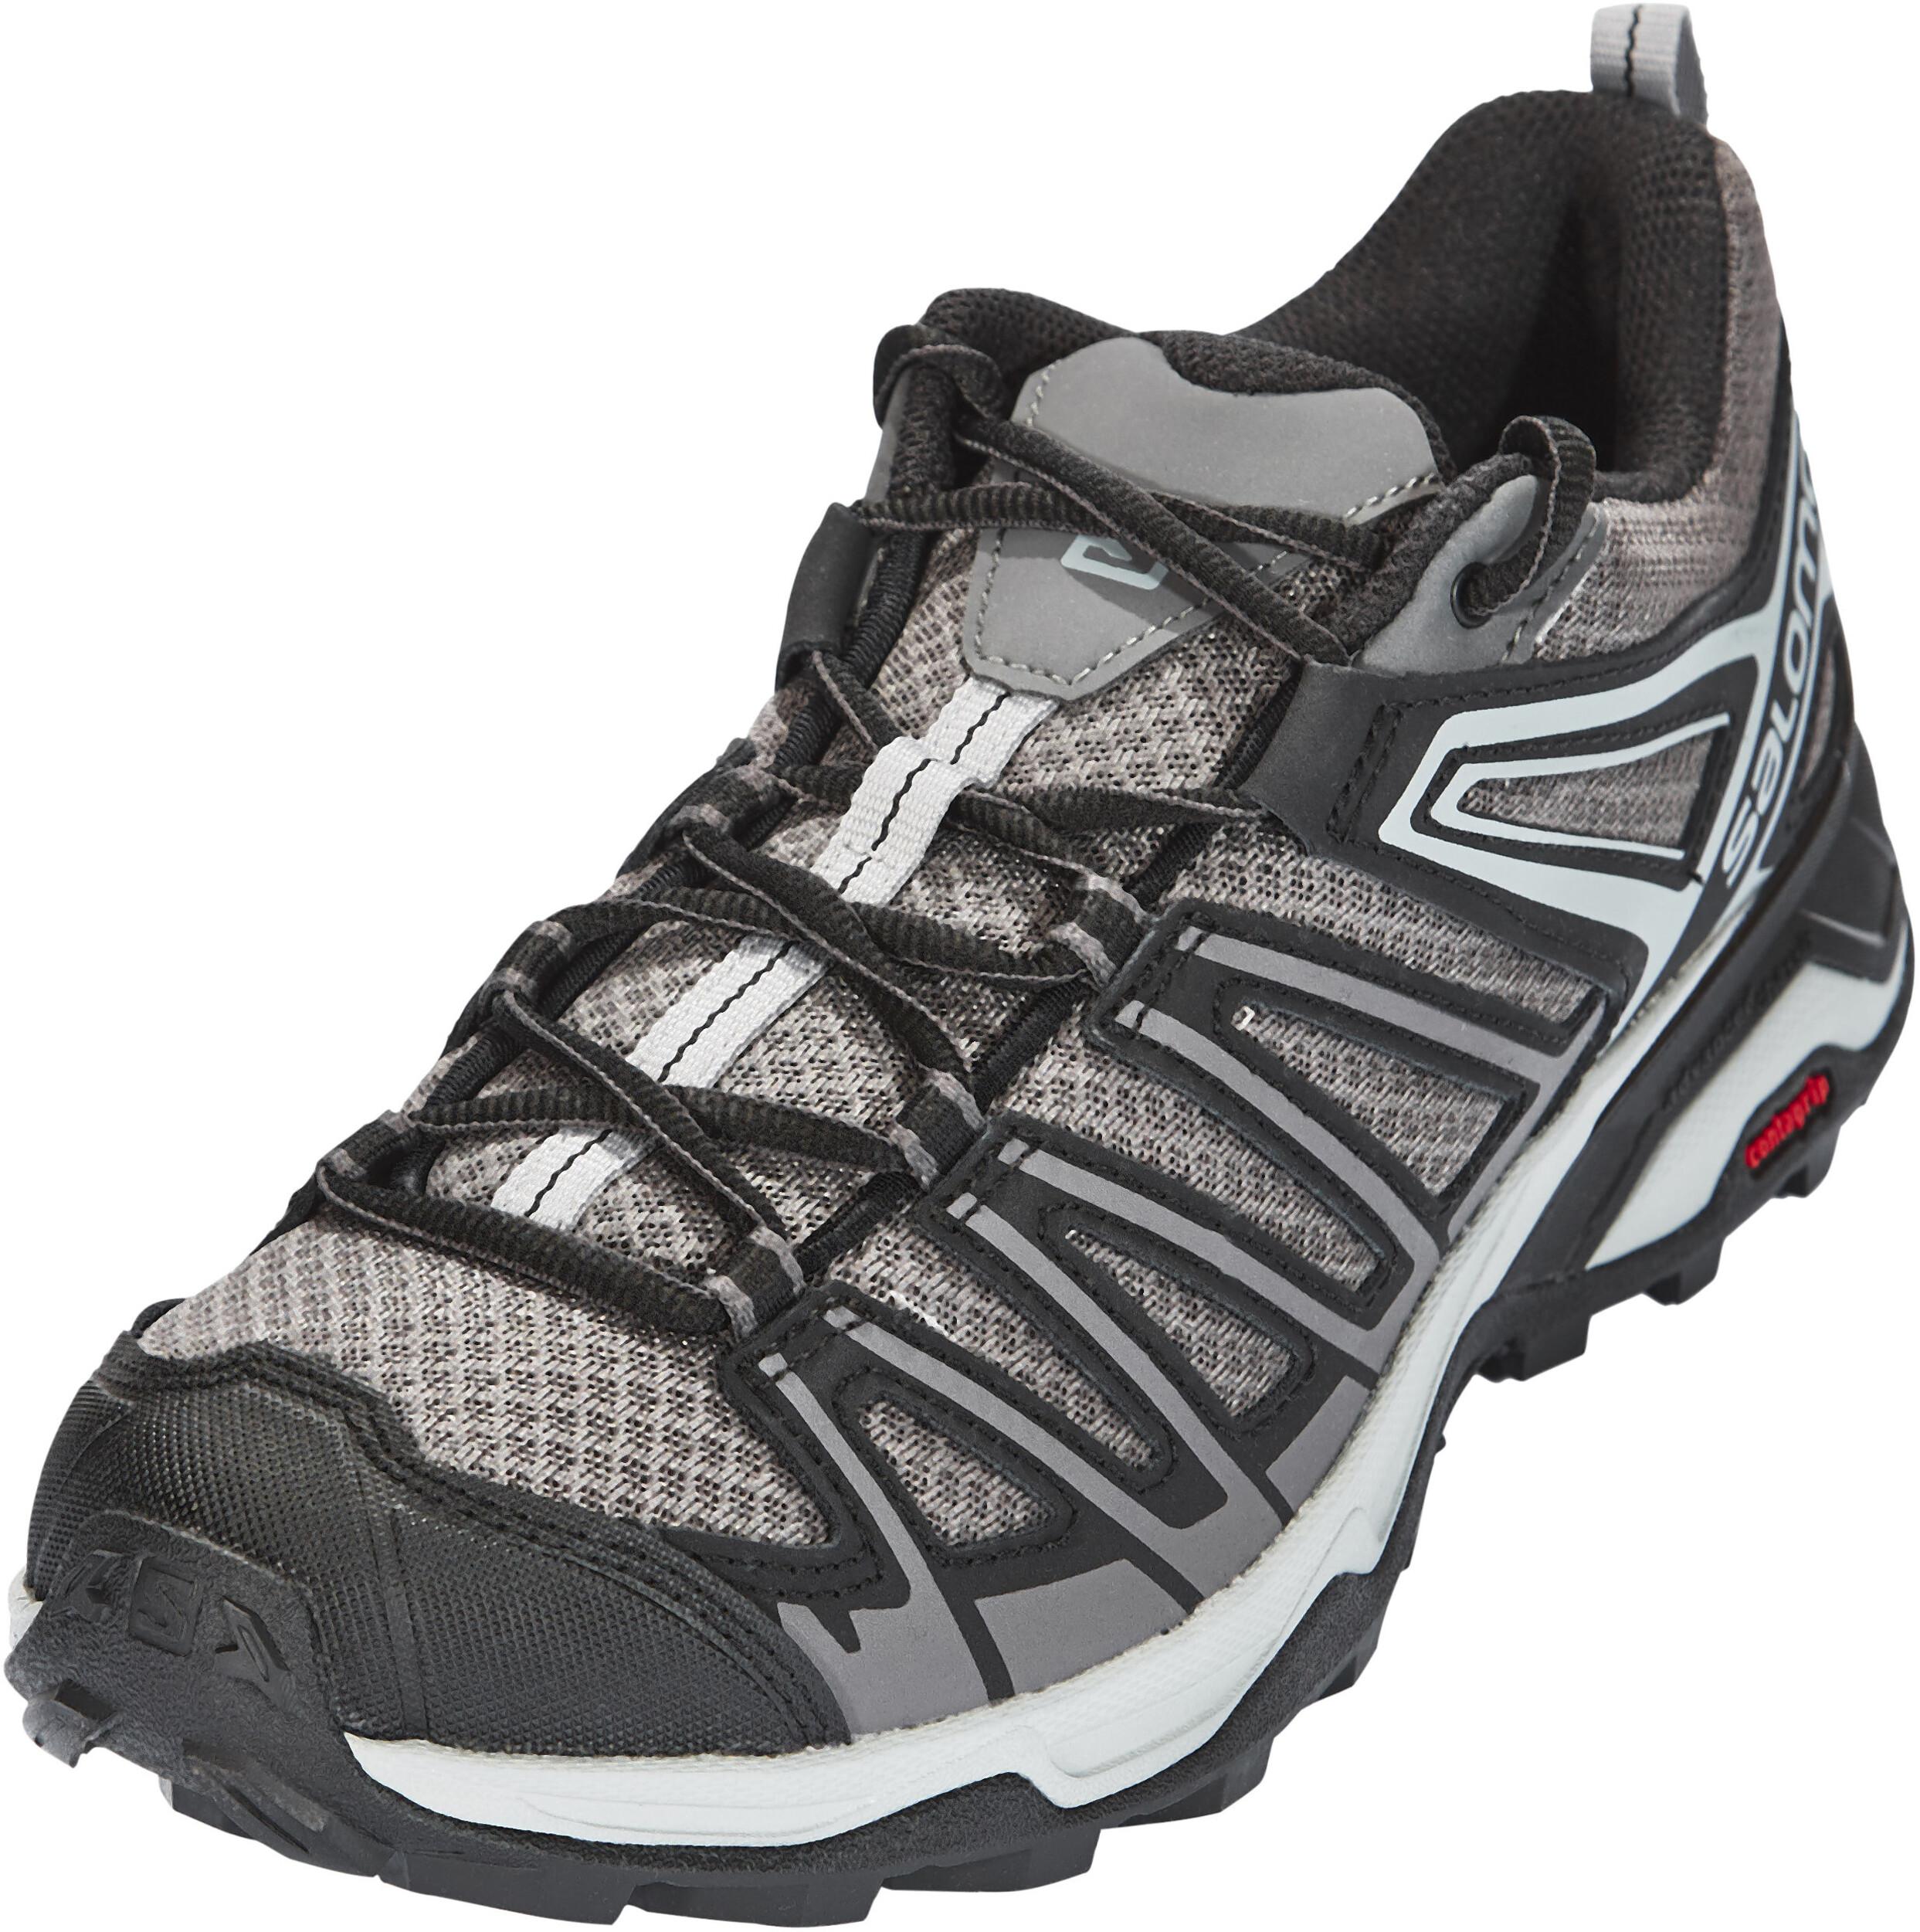 Salomon X Ultra 3 Prime Shoes Men grey at Addnature.co.uk 20f25b235d40